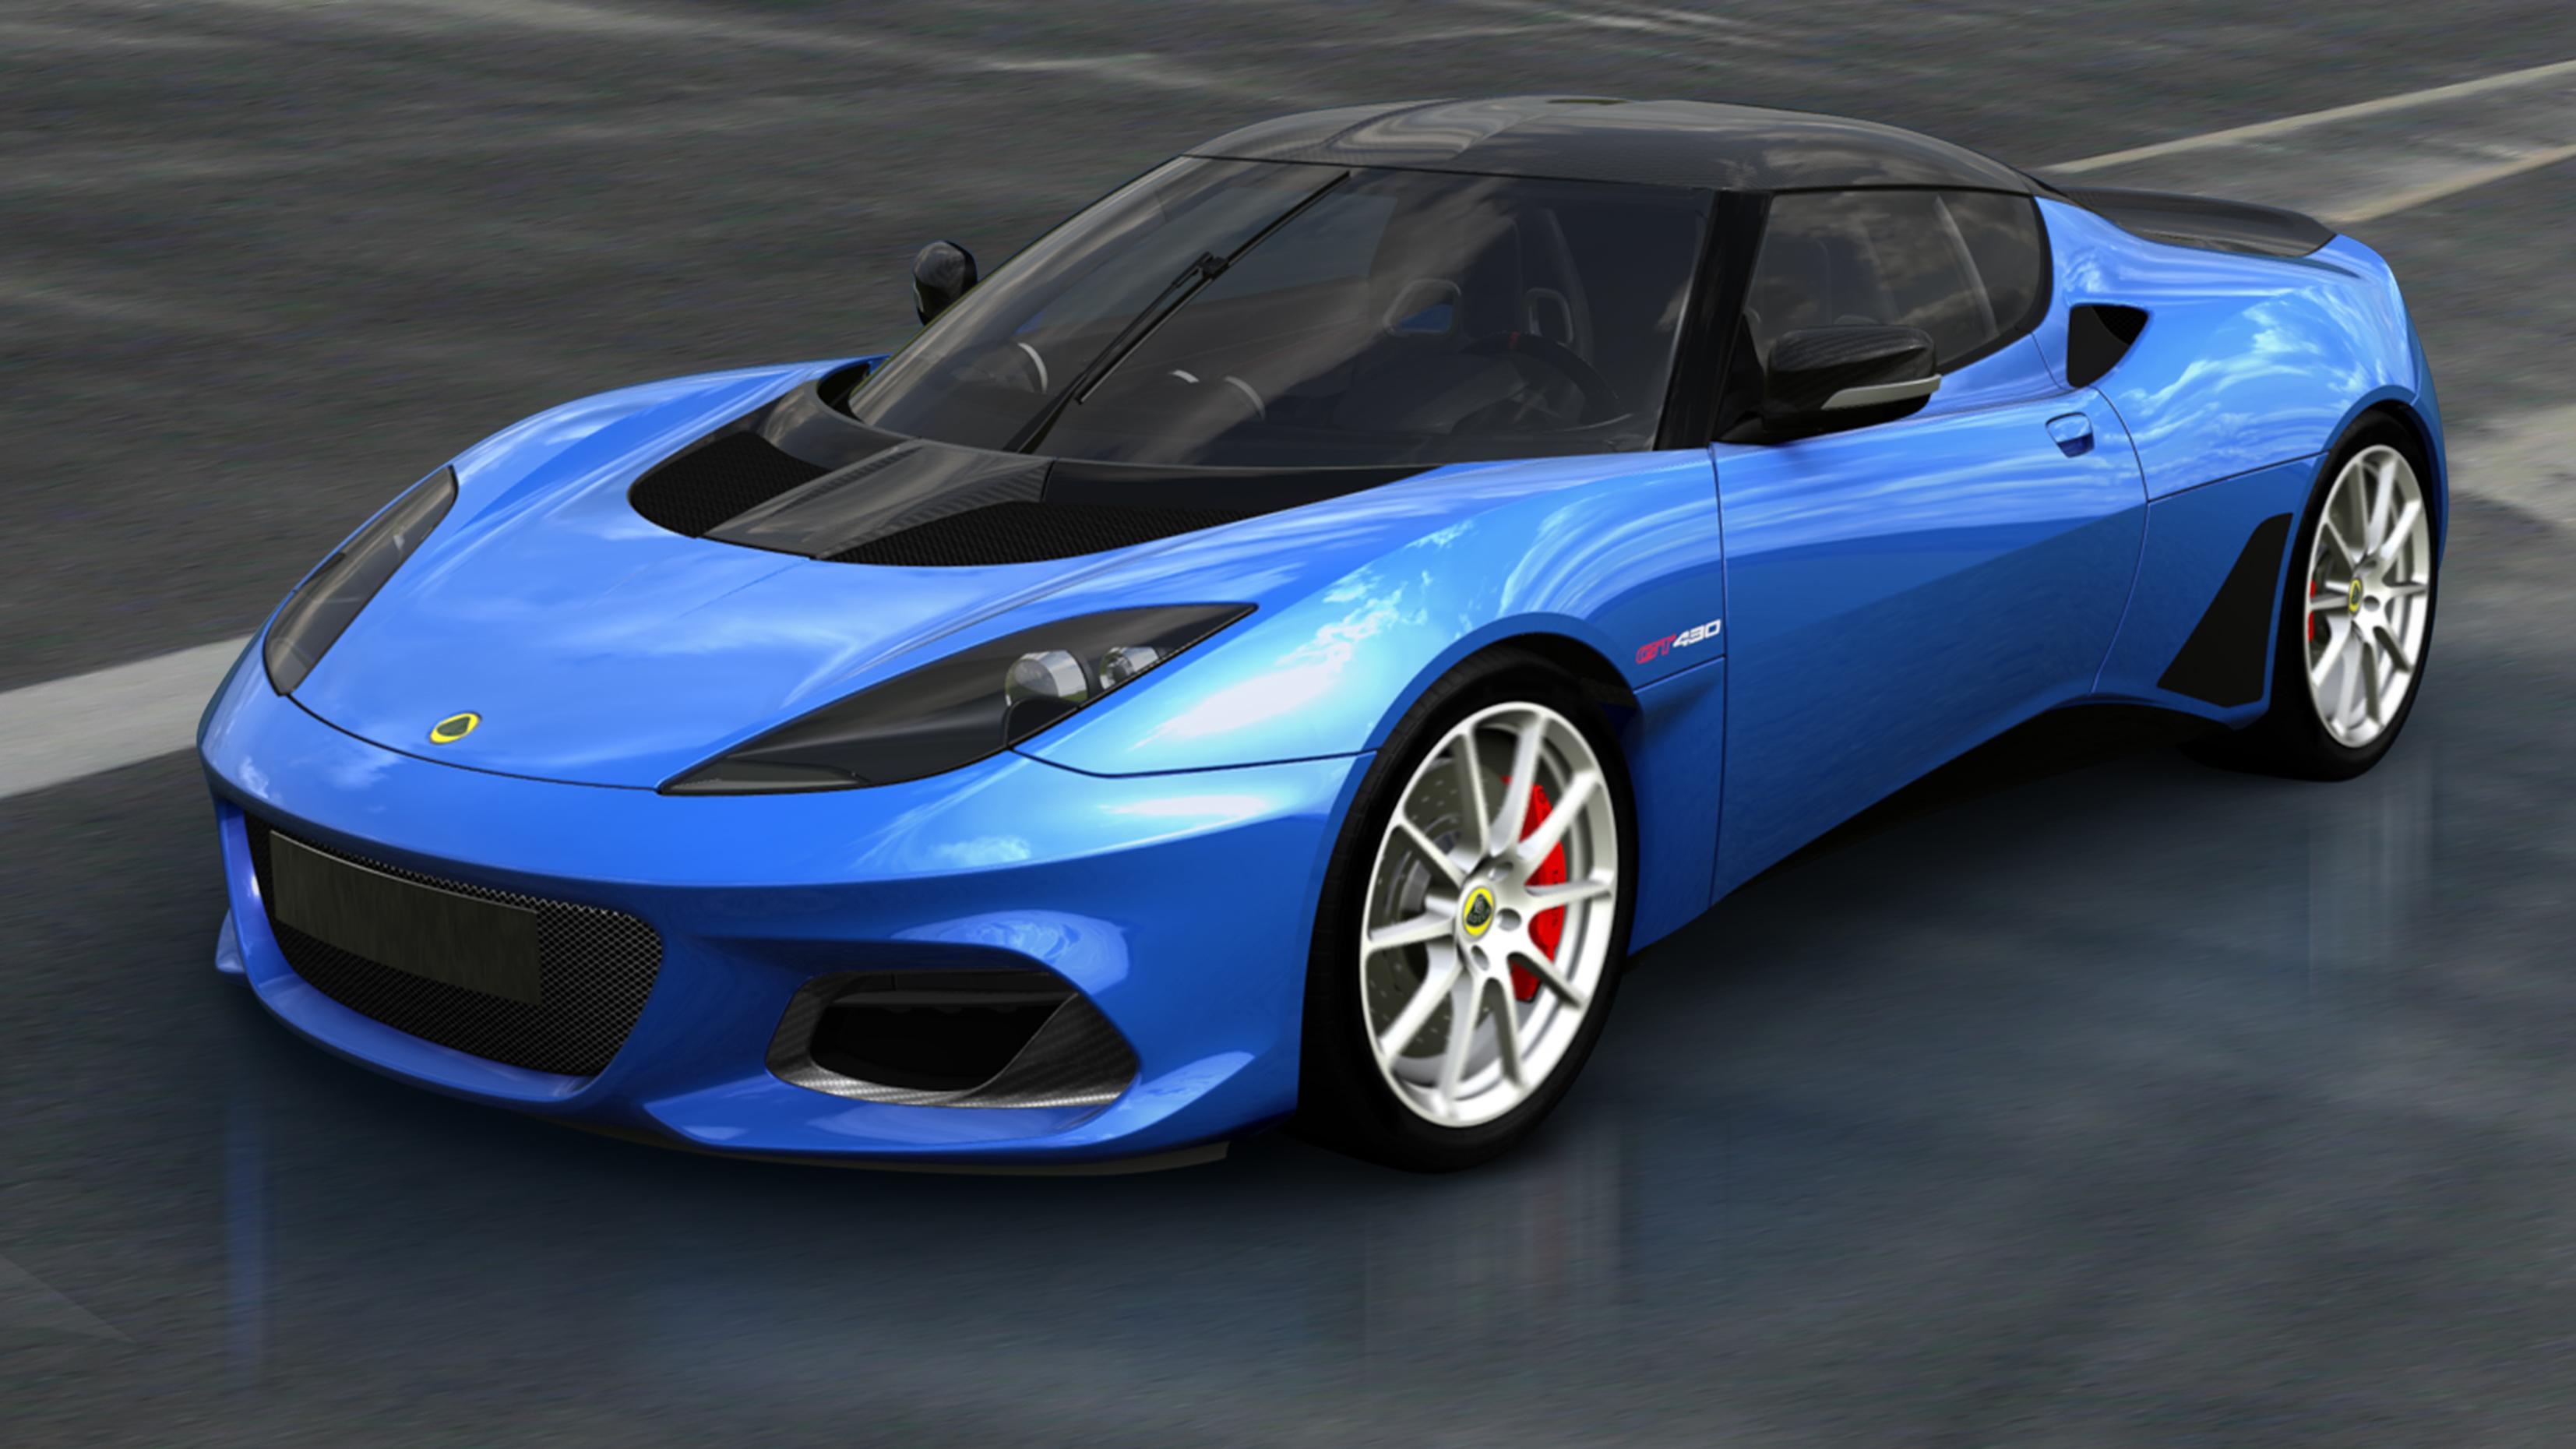 The New Expanded Lotus Evora Gt430 Range